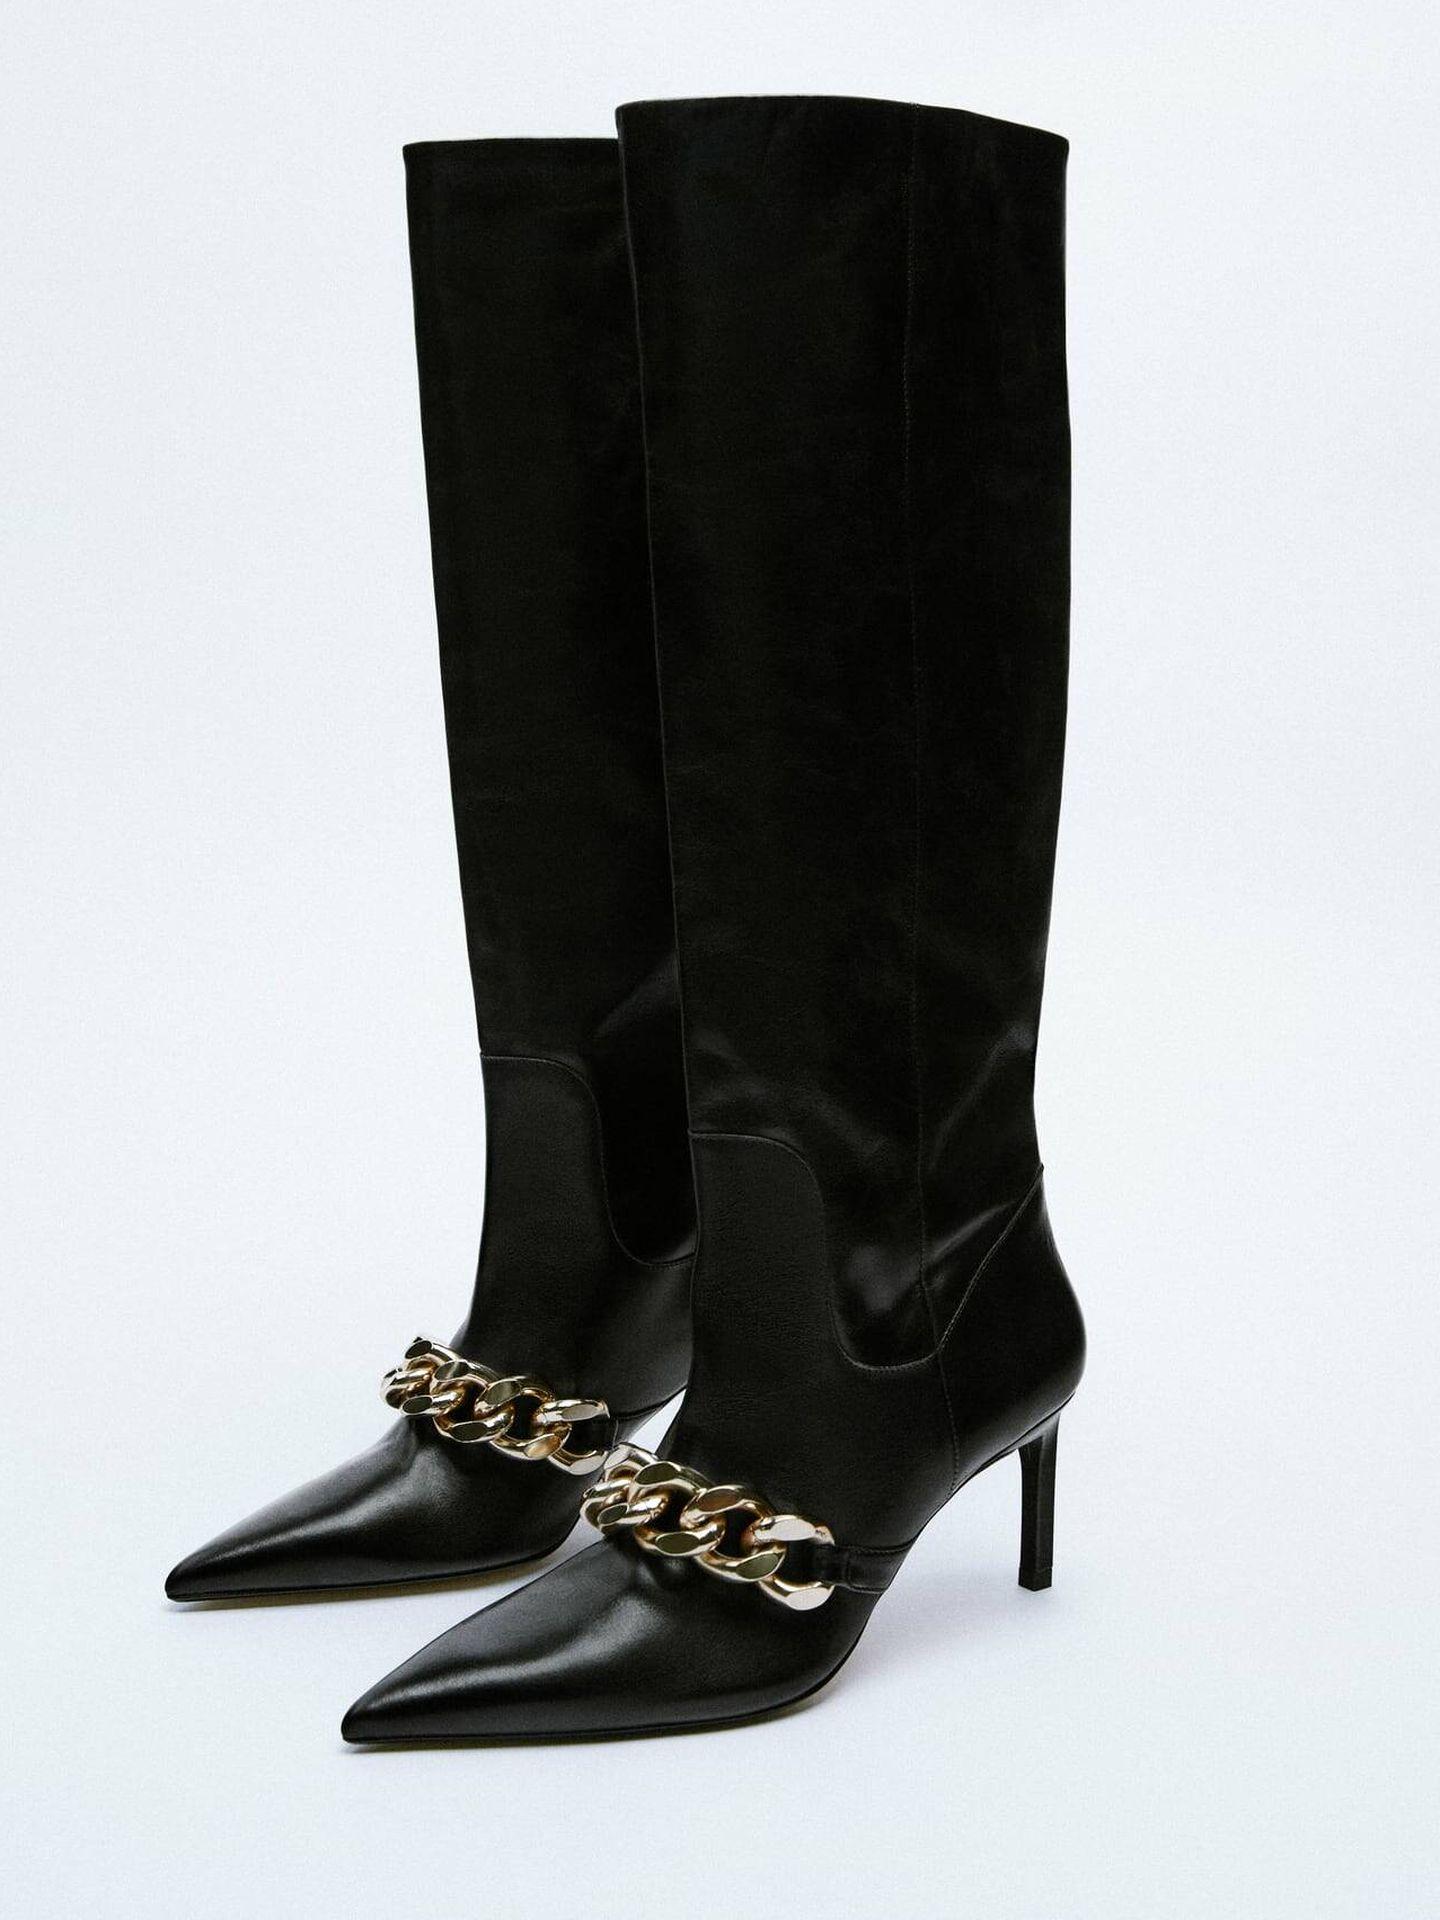 Botas altas de tacón de Zara. (Cortesía)